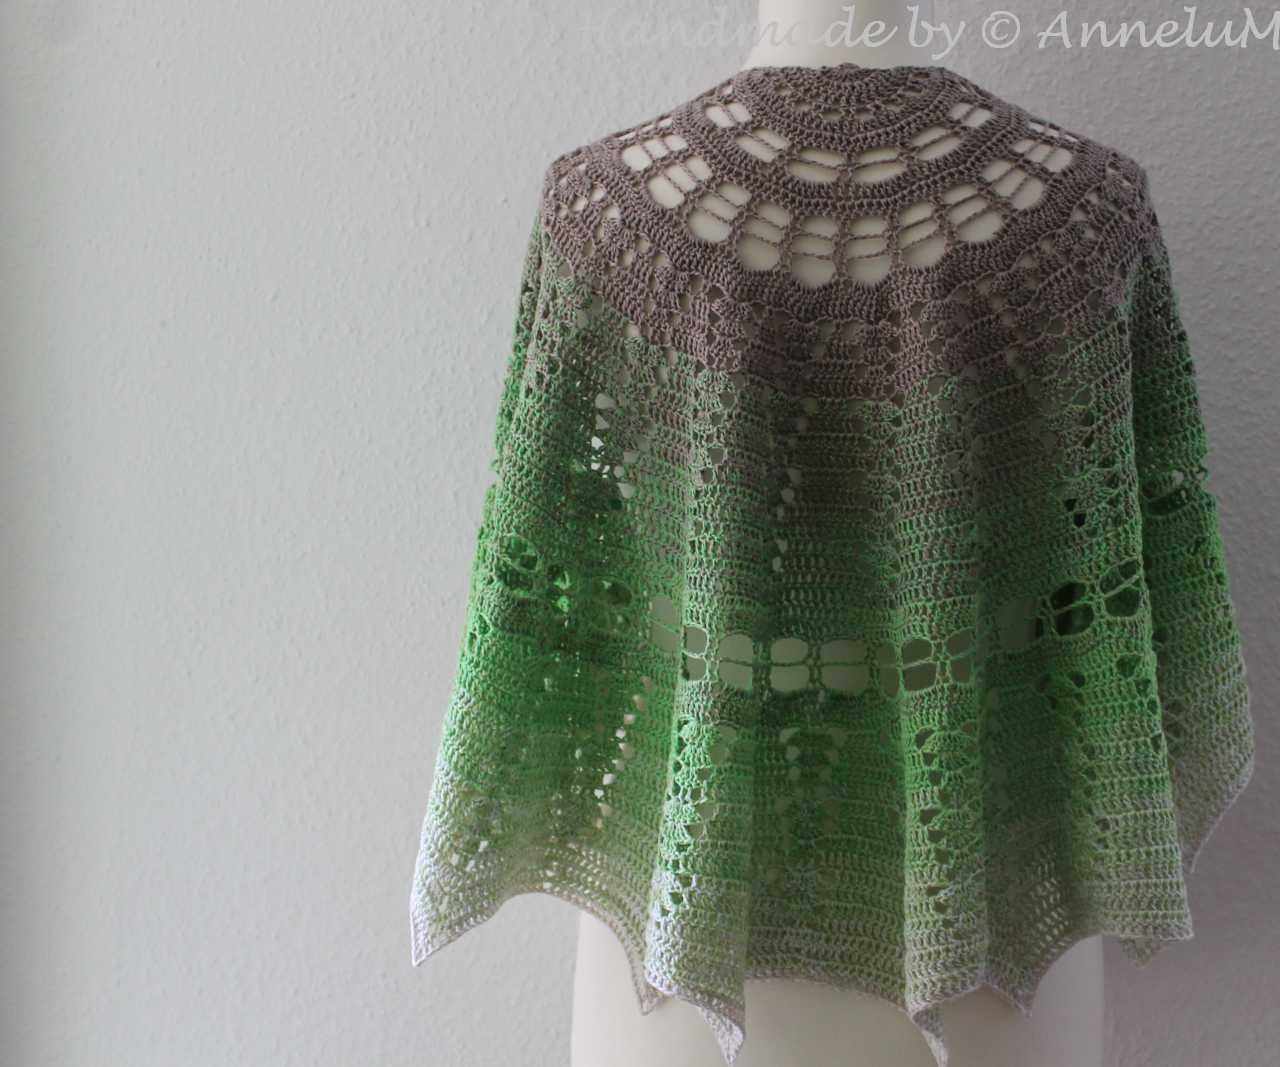 Galadhrim Handmade by AnneluM